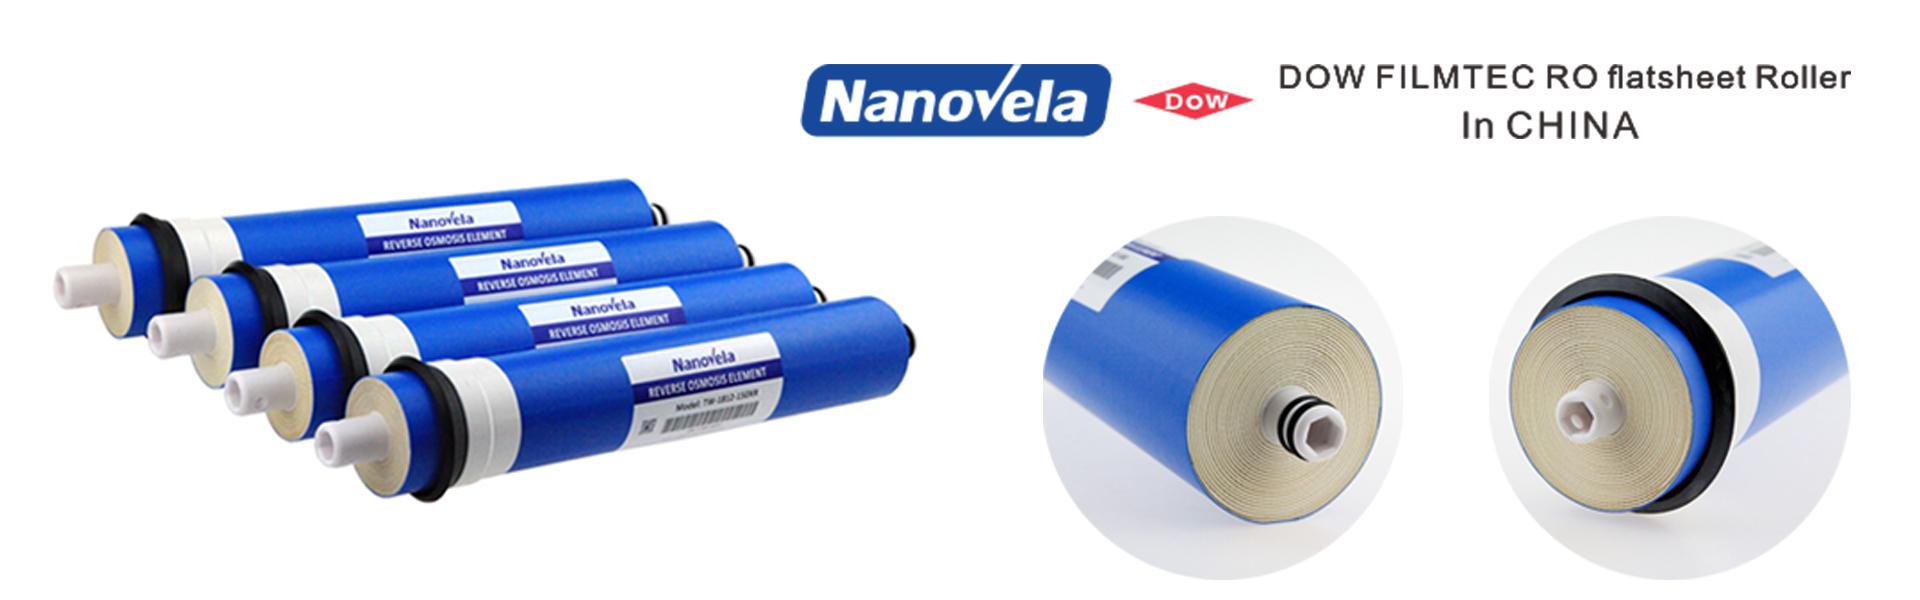 Nanovela banner3